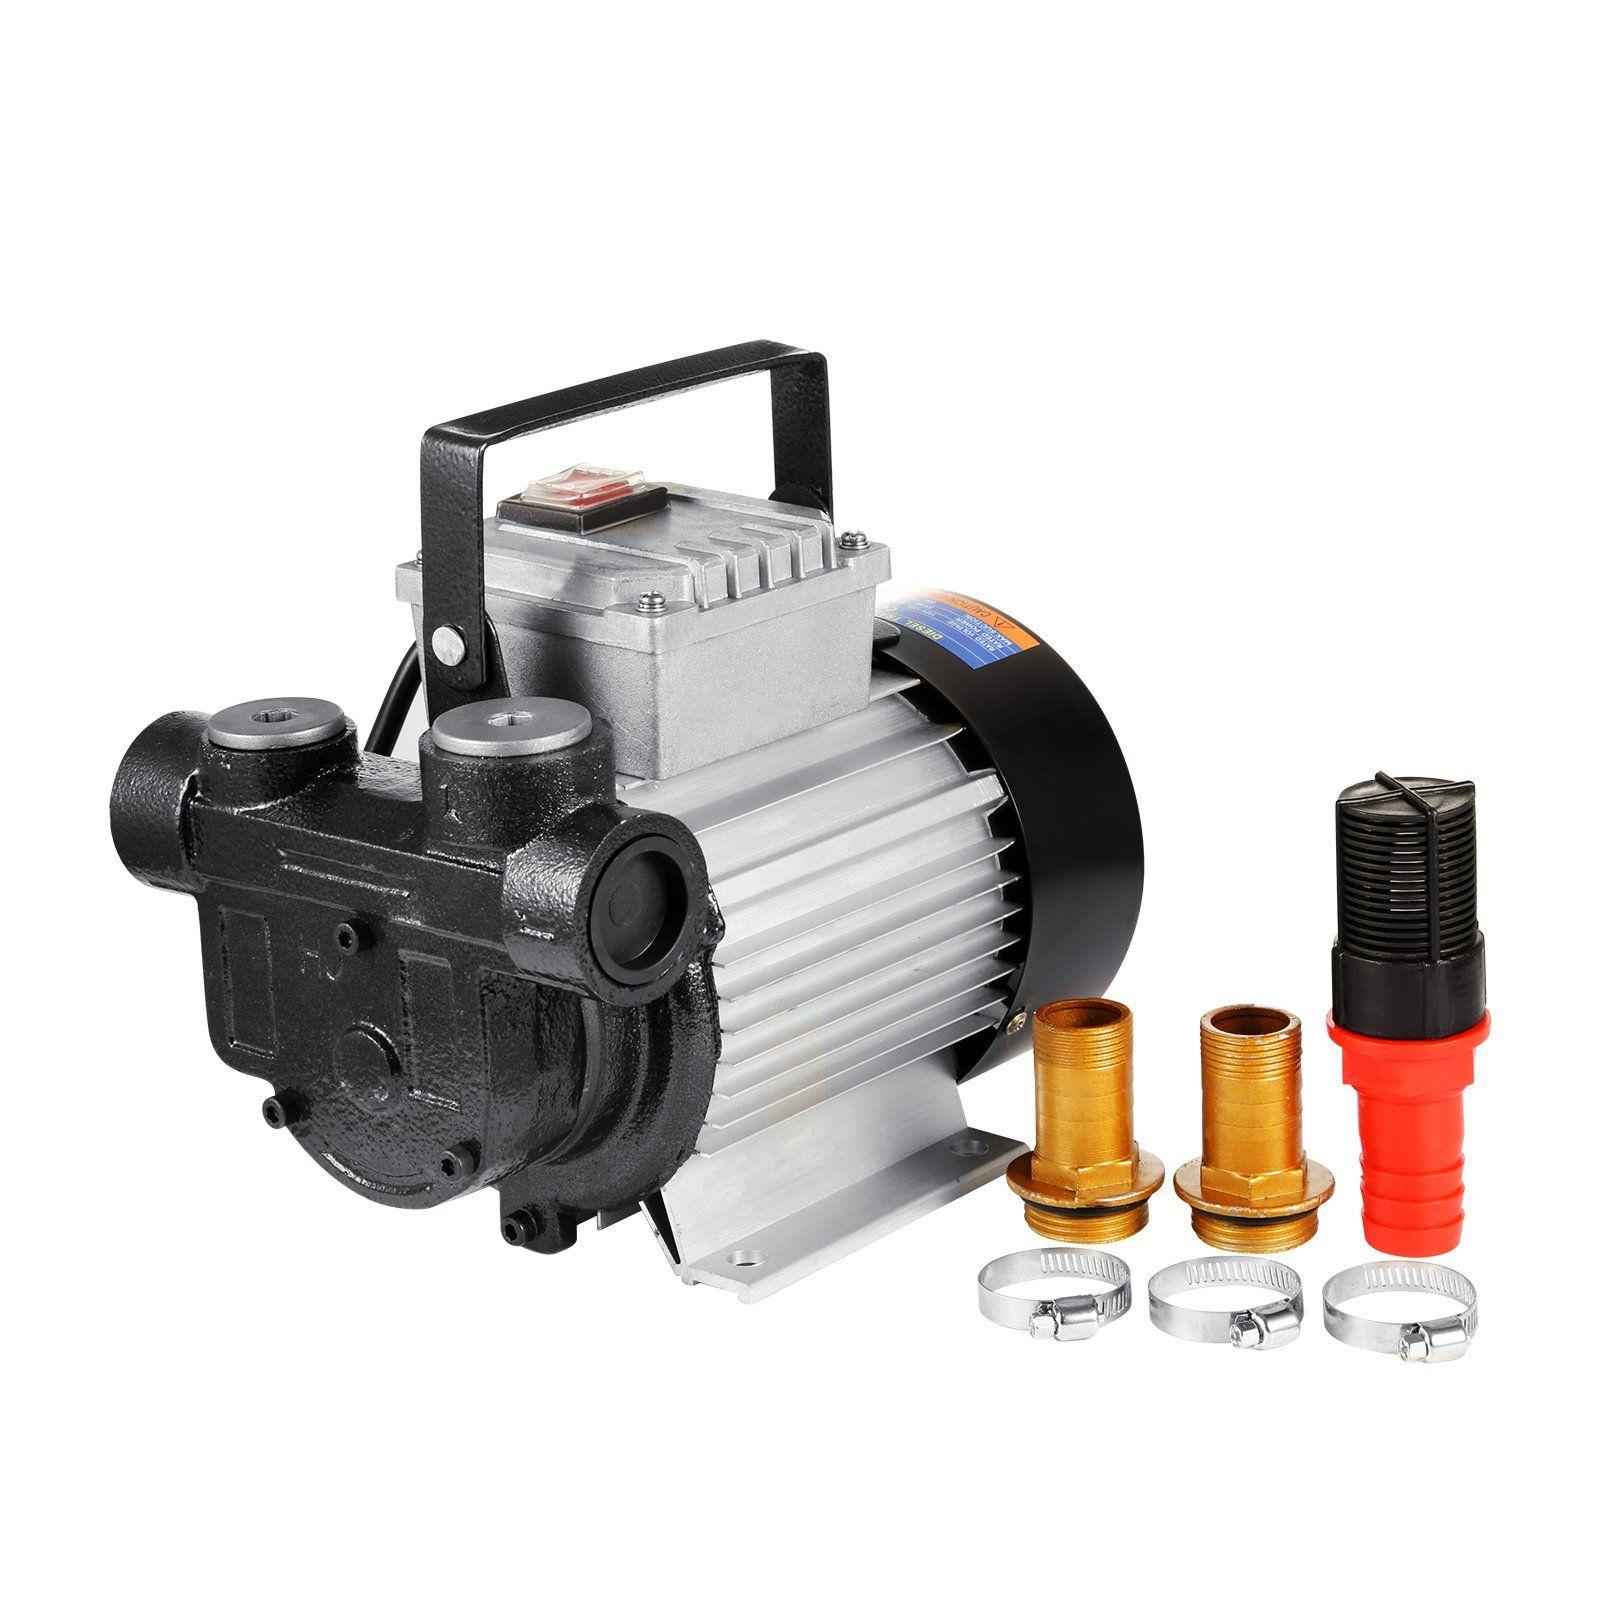 vevor 110v fuel oil transfer pump ac 16gpm self priming electric